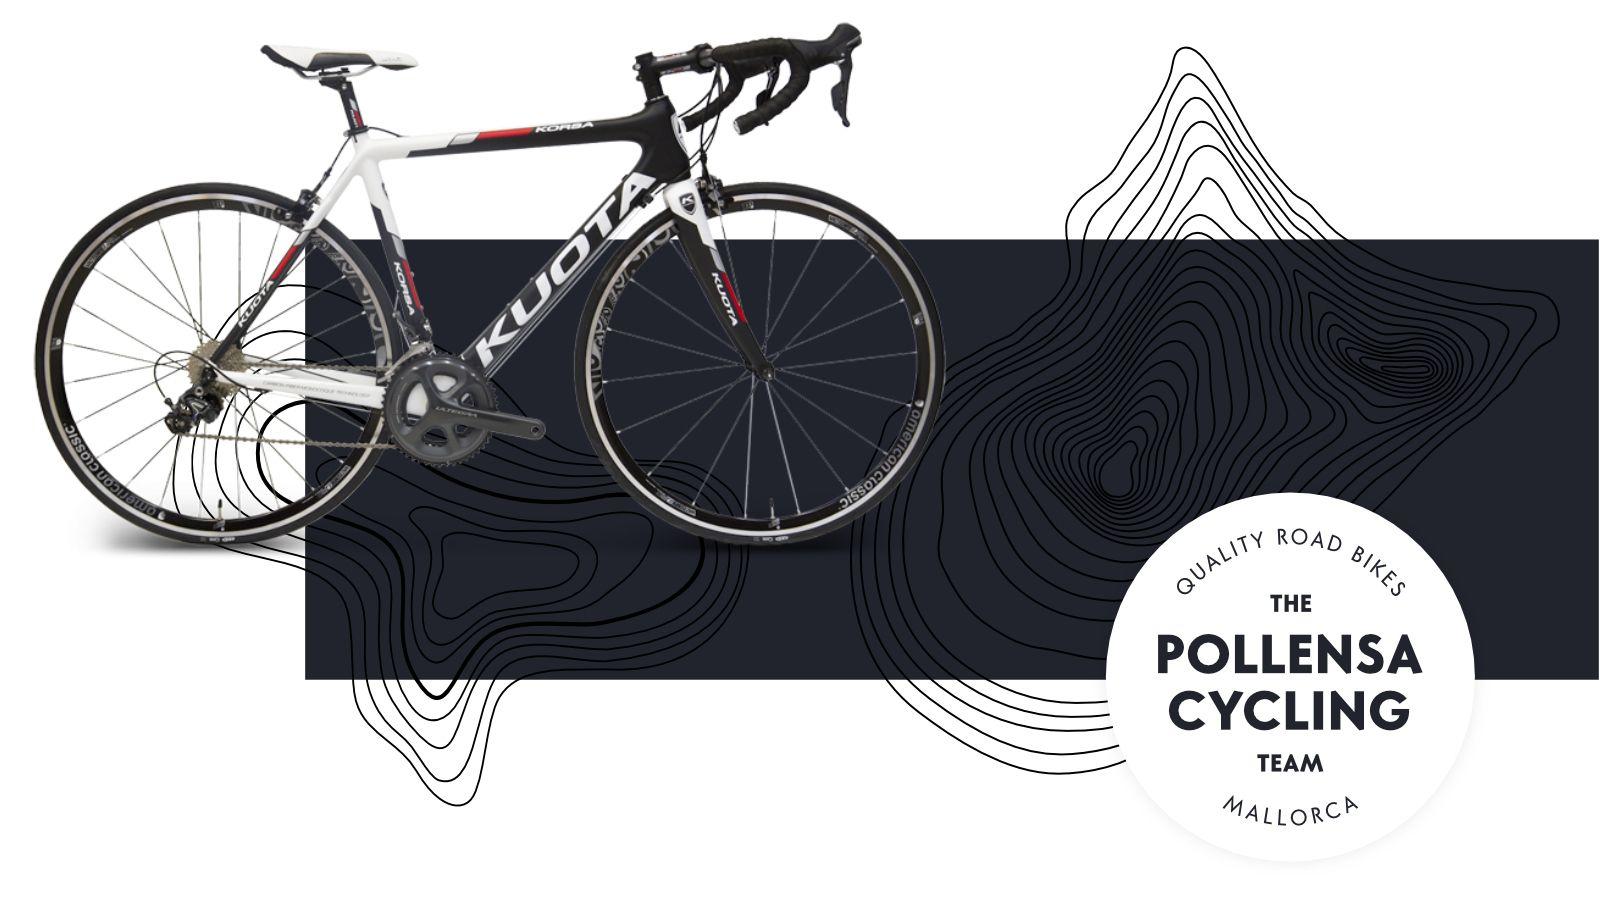 Pollensa Cycling